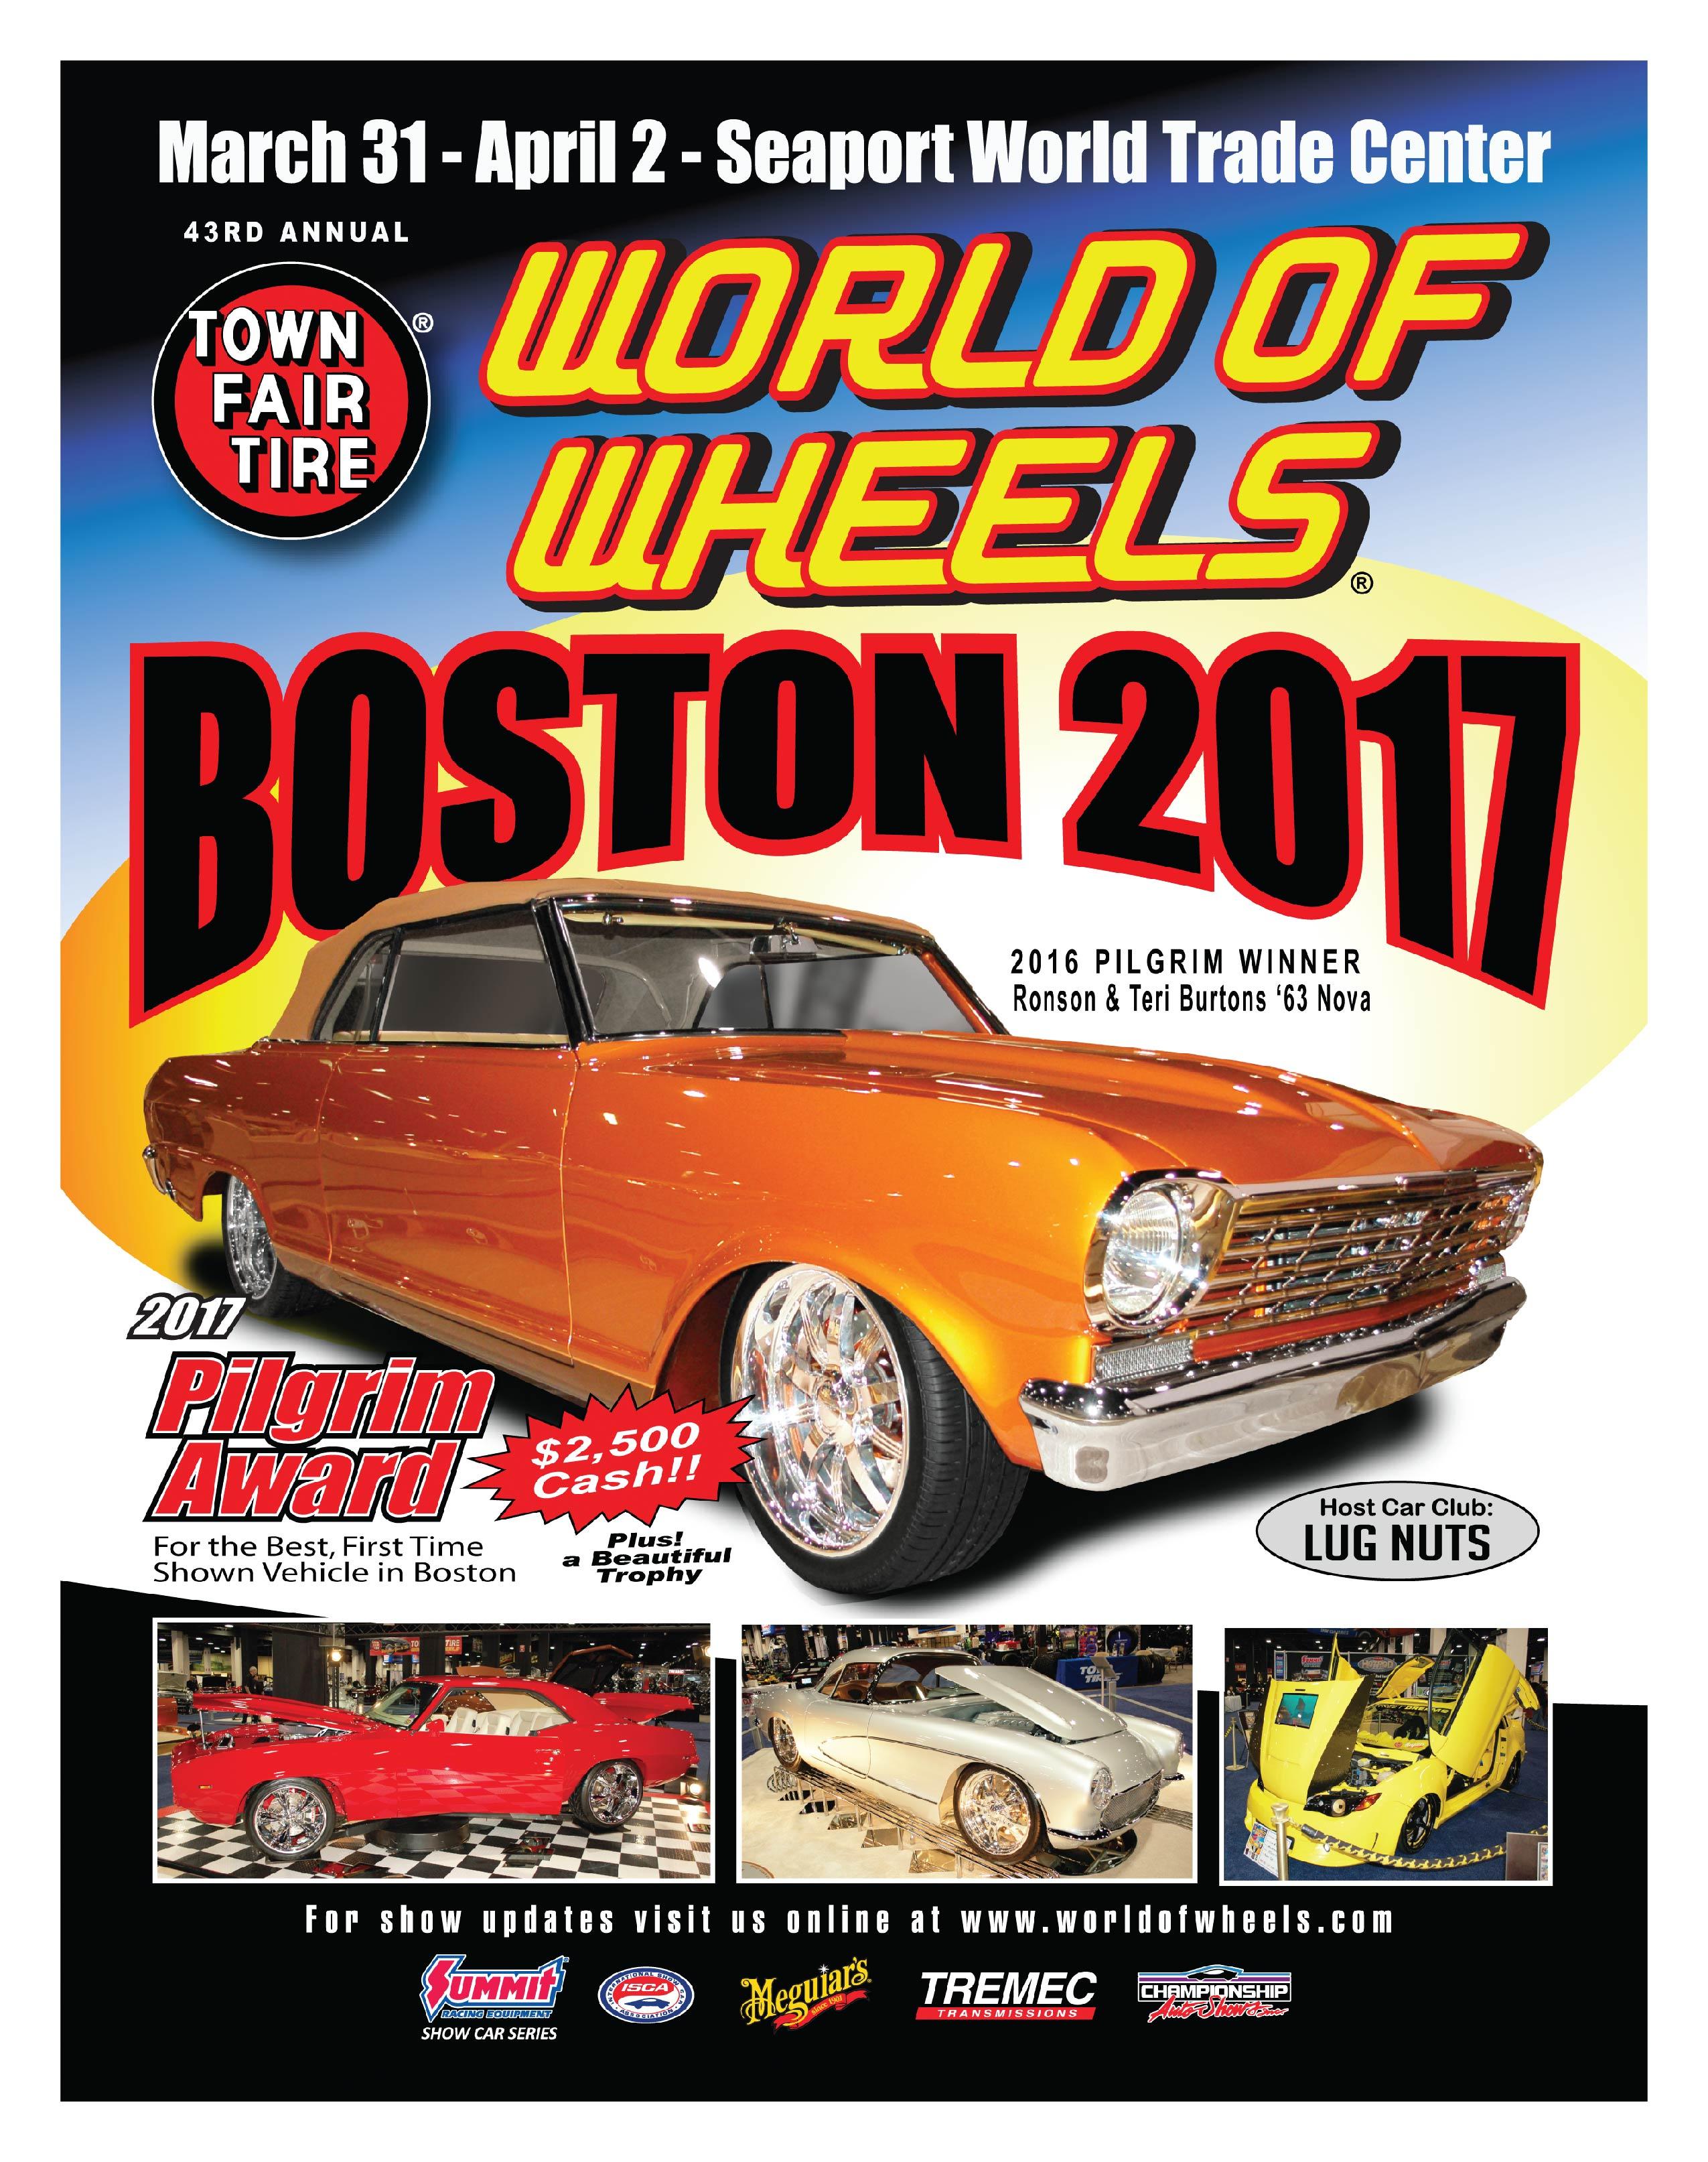 Boston world of wheels 2017 at seaport world trade center for Craft fair boston 2017